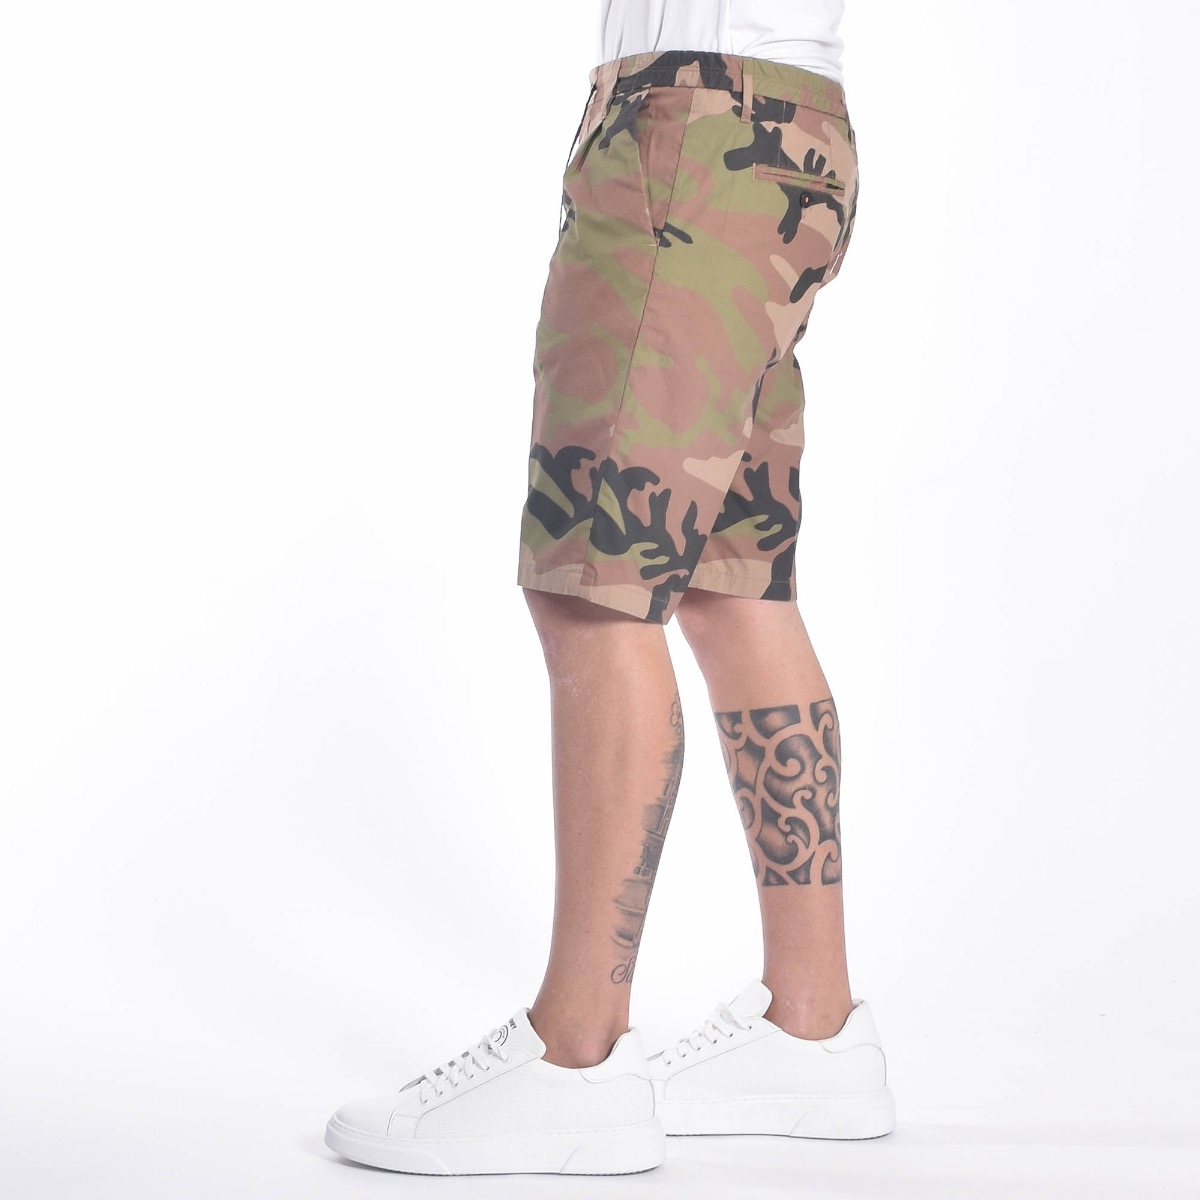 Bermuda - Camouflage